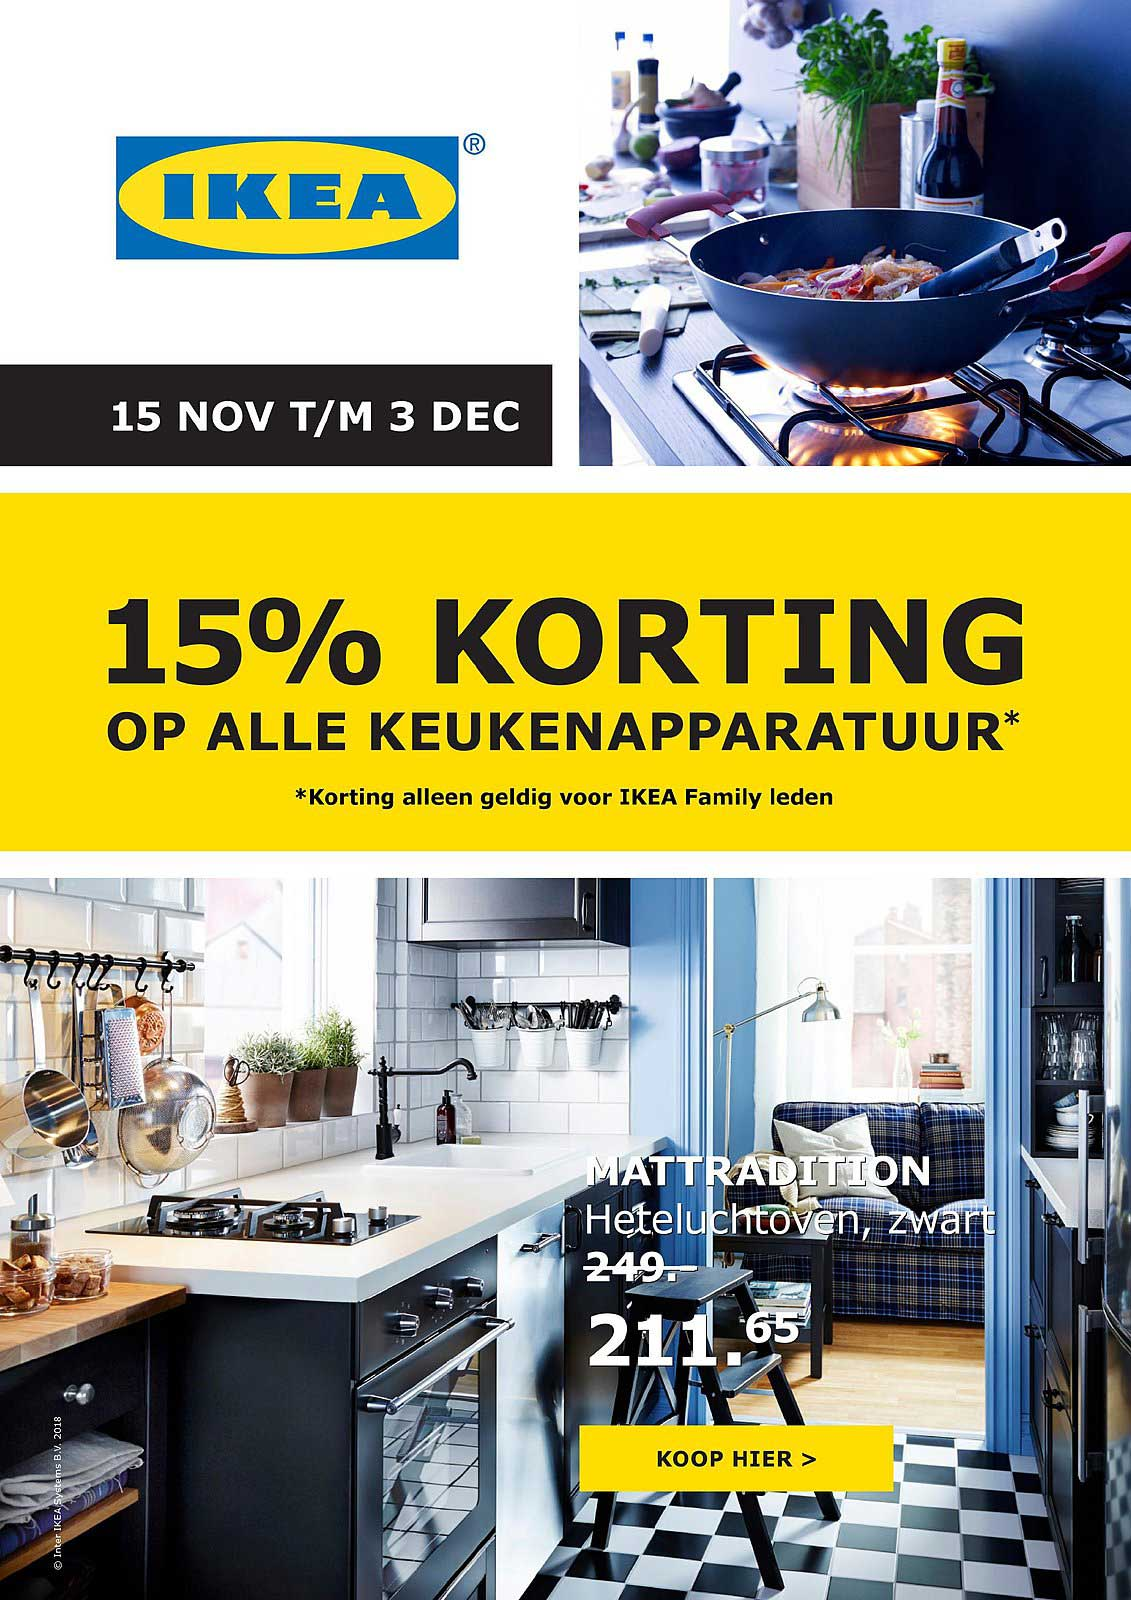 IKEA 15% Korting Op Alle Keukenapparatuur